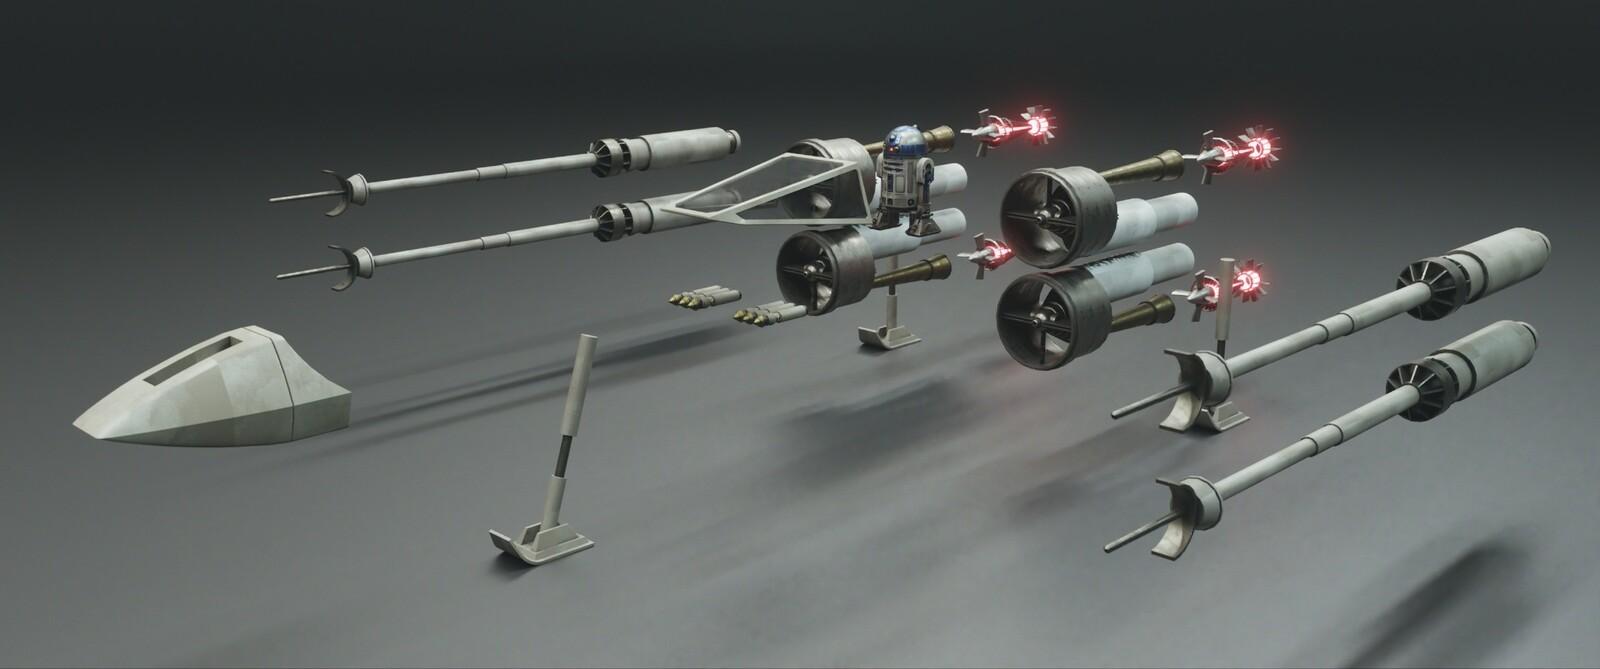 Next starwars project....